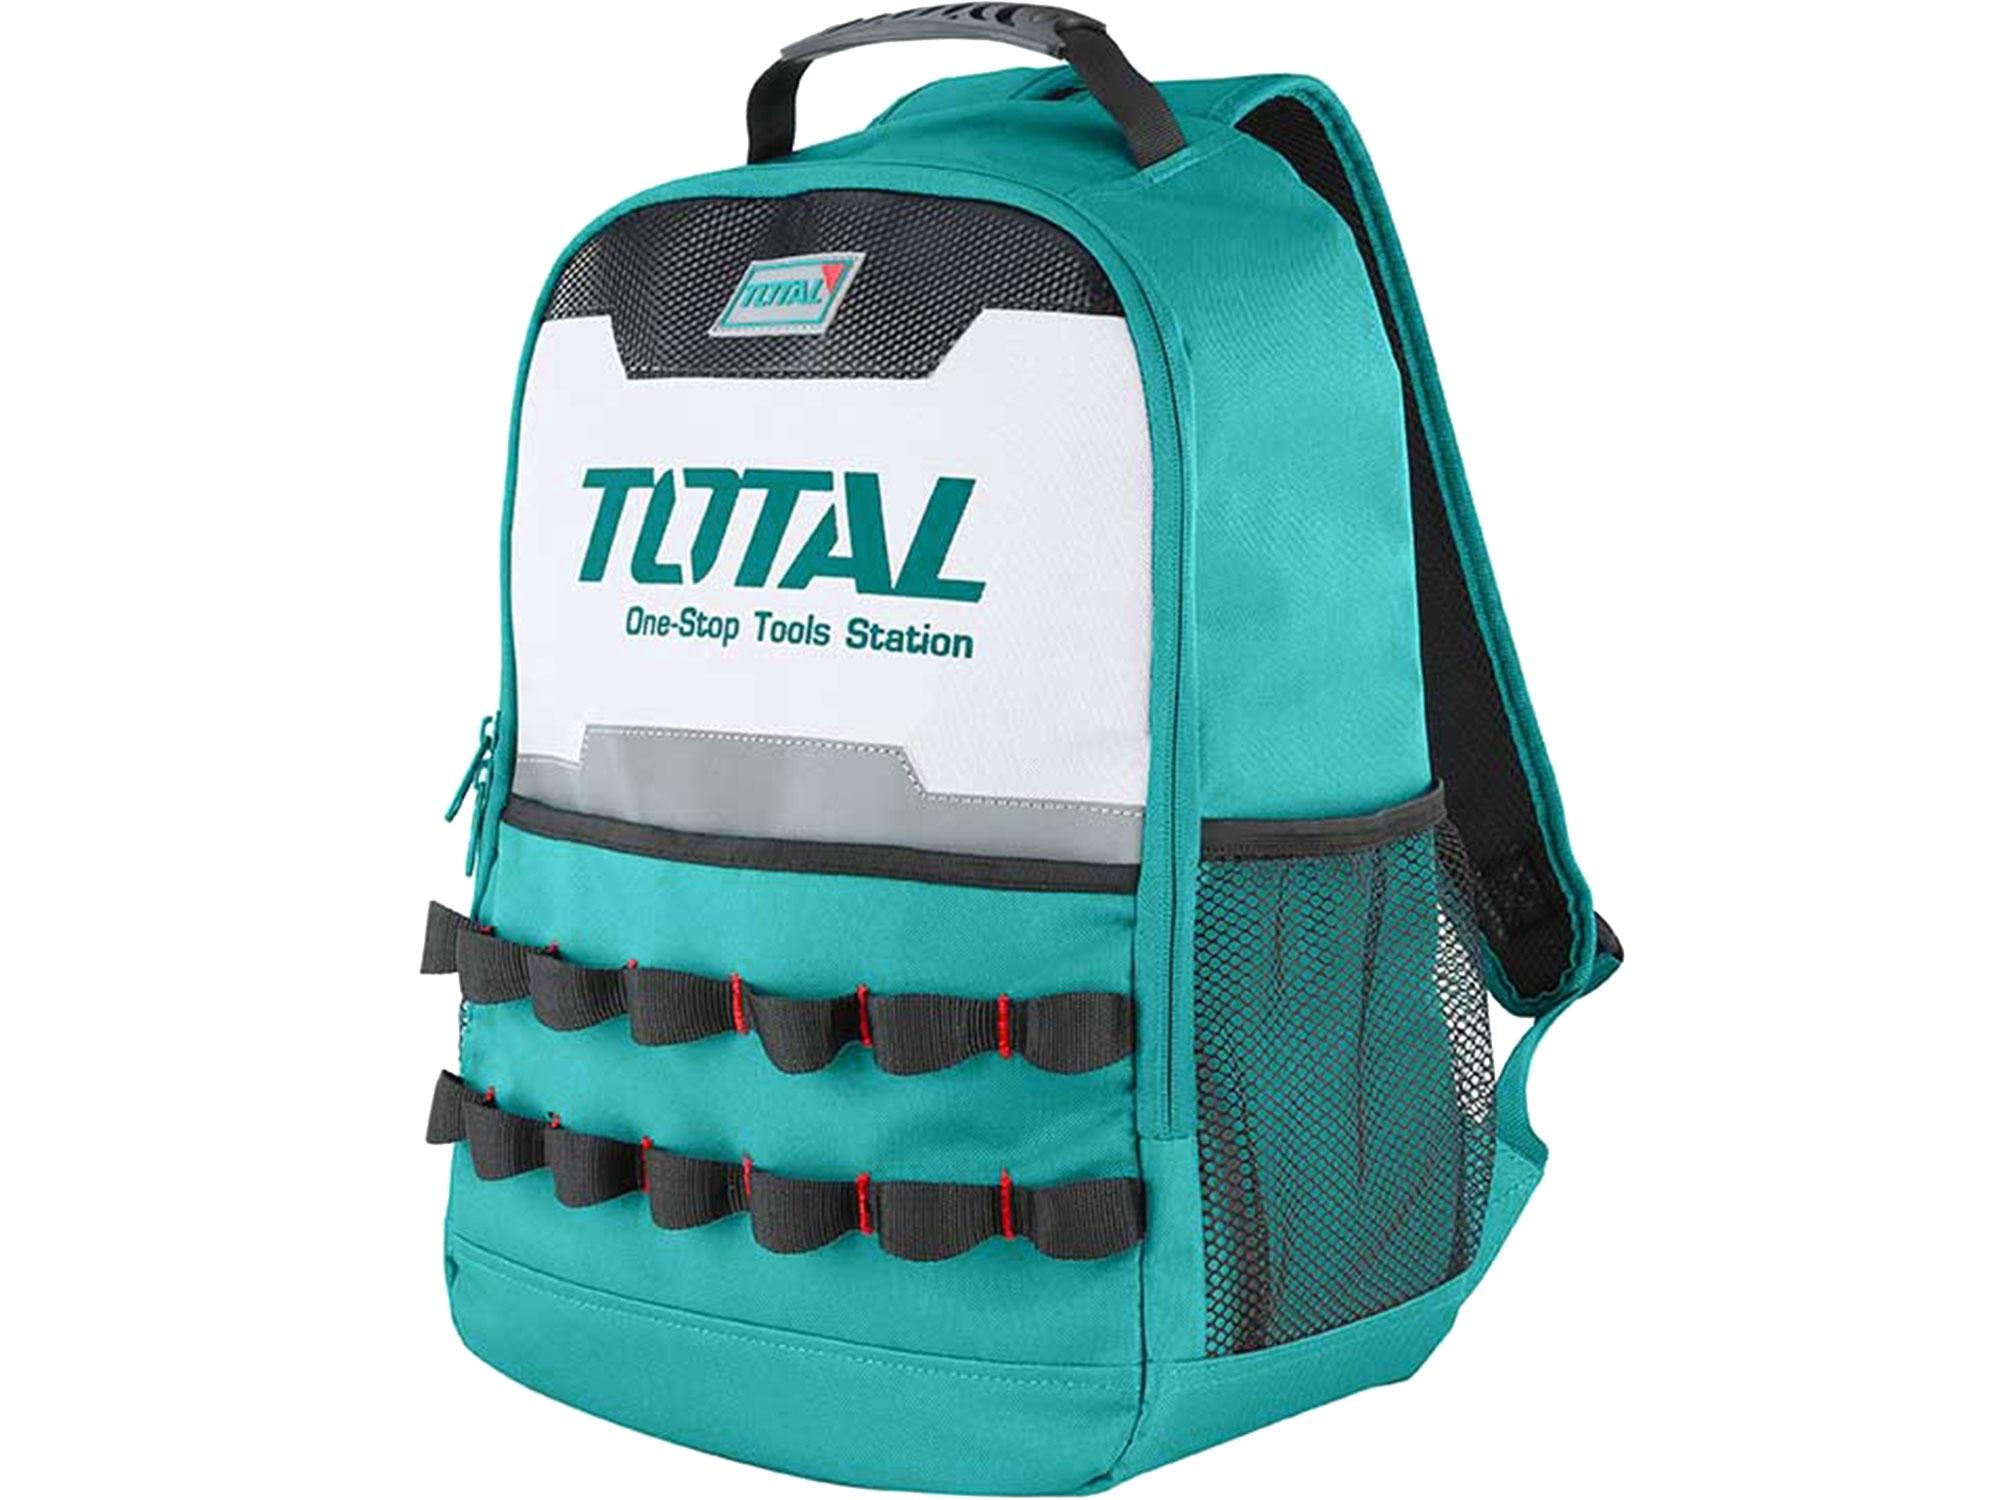 TOTAL THBP0201 Batoh na nářadí, industrial